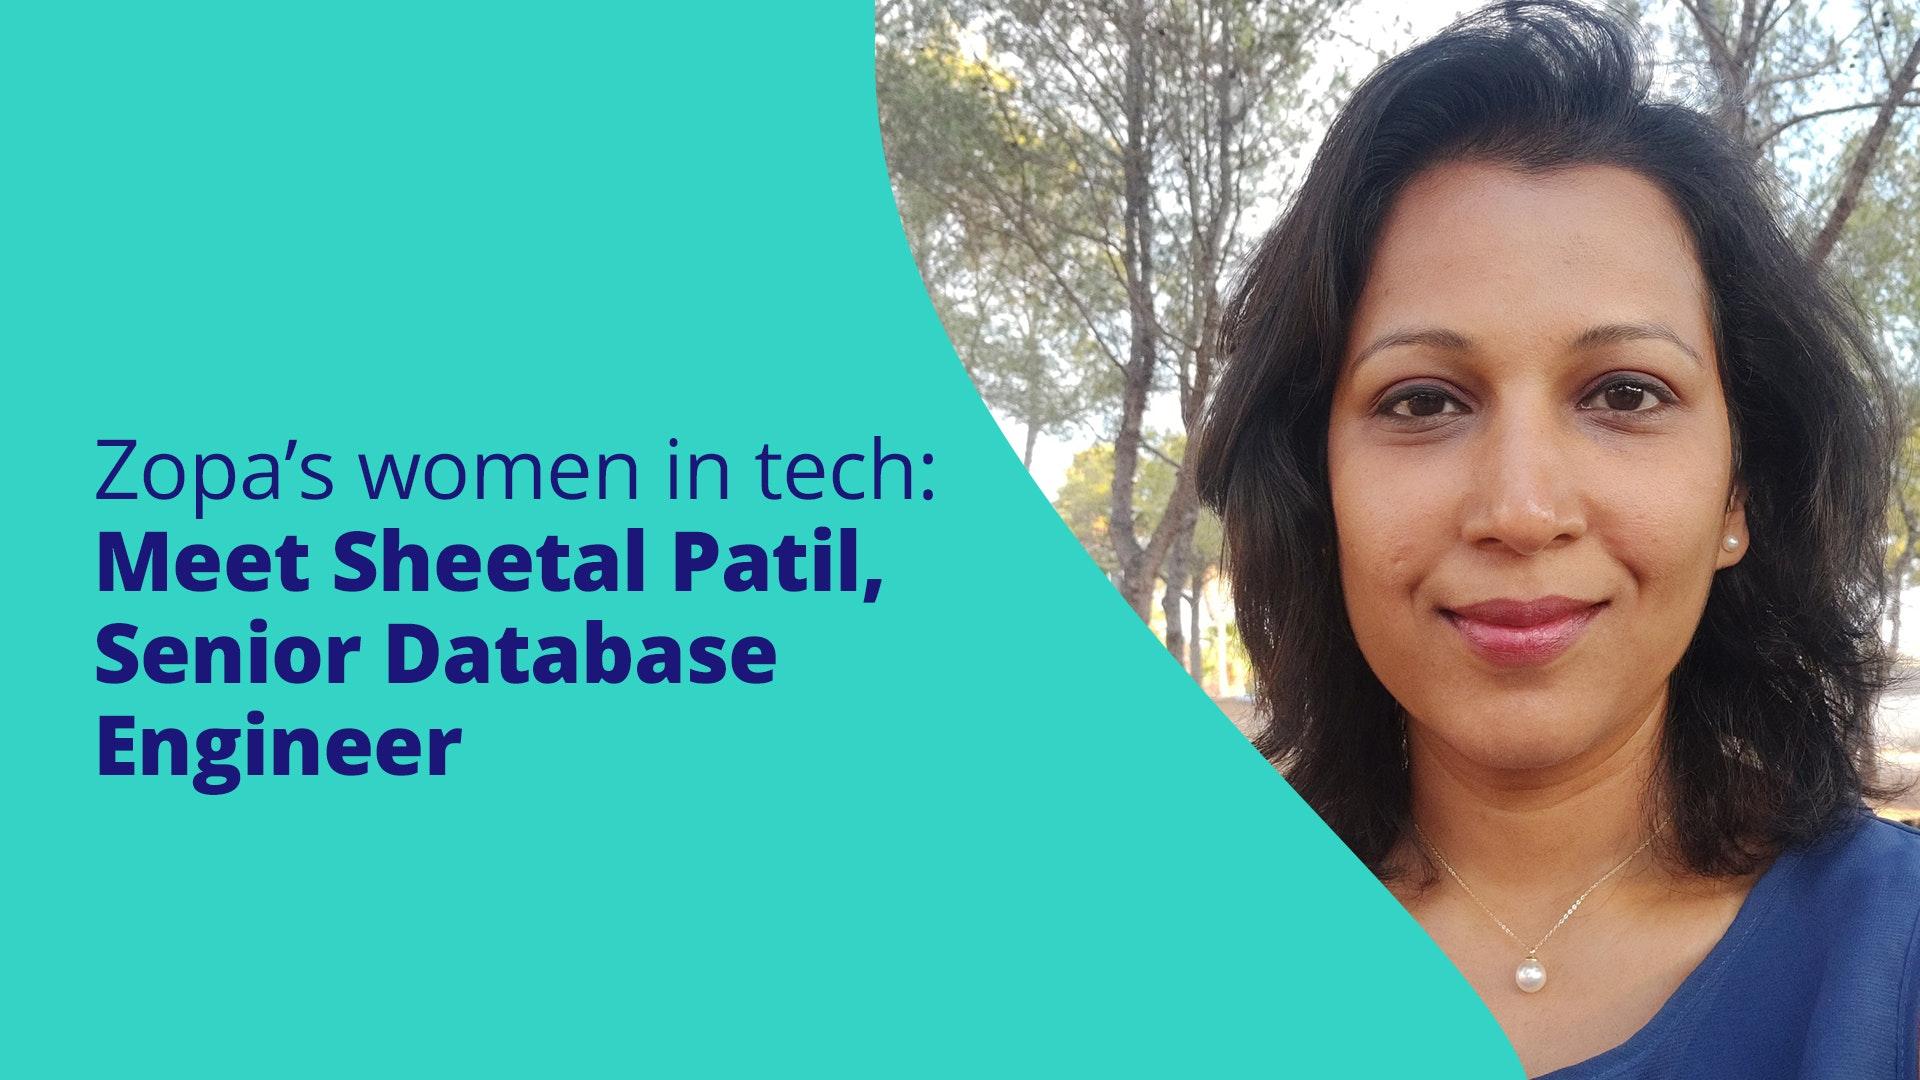 zopa-s-women-in-tech-meet-sheetal-patil-senior-database-engineer